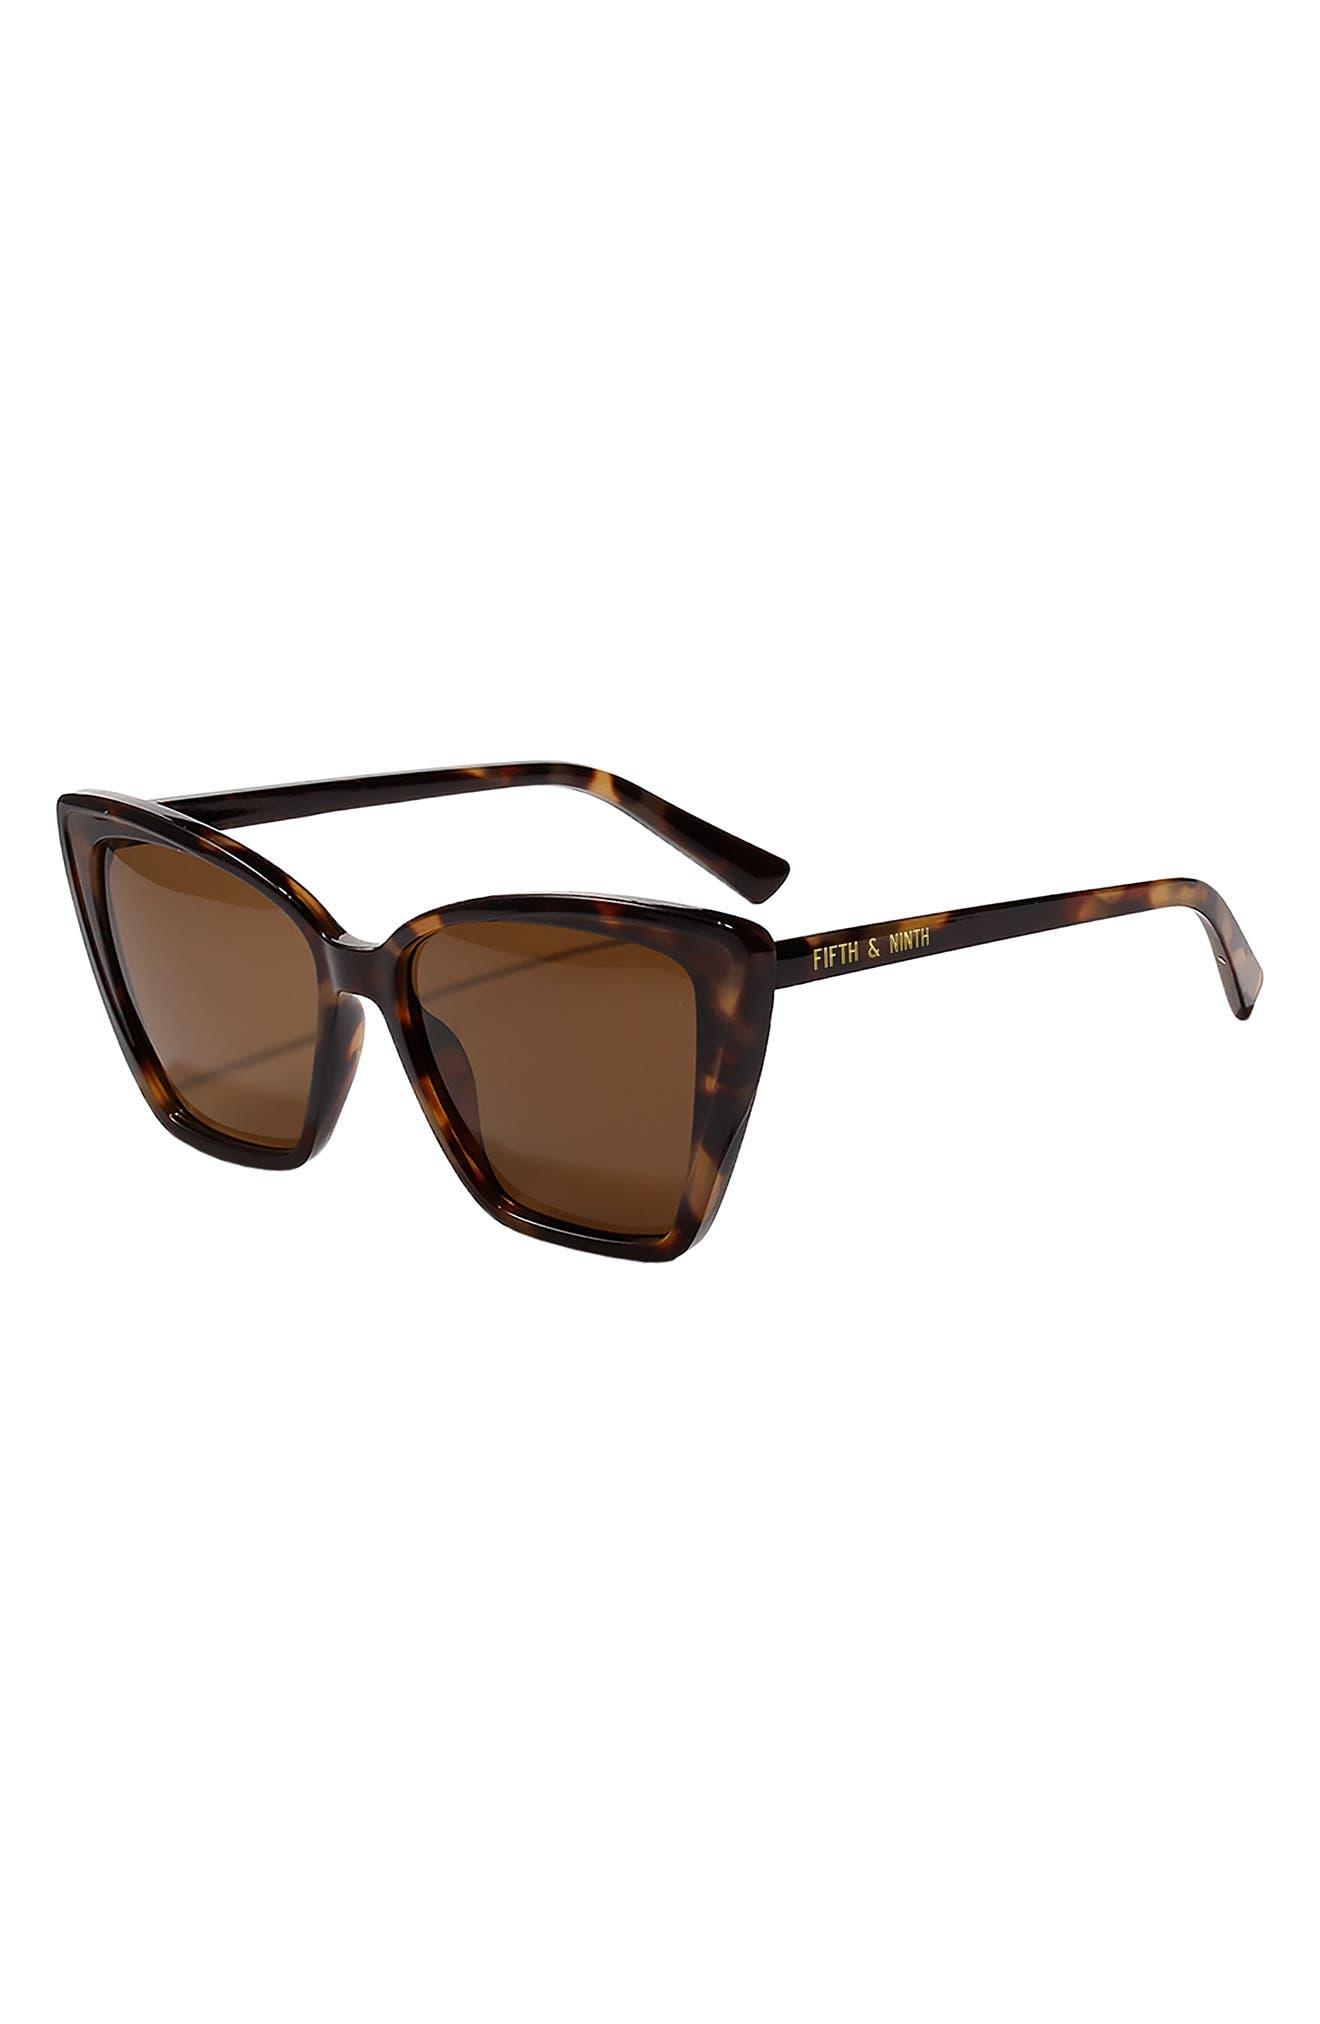 Moscow 53mm Cat Eye Sunglasses